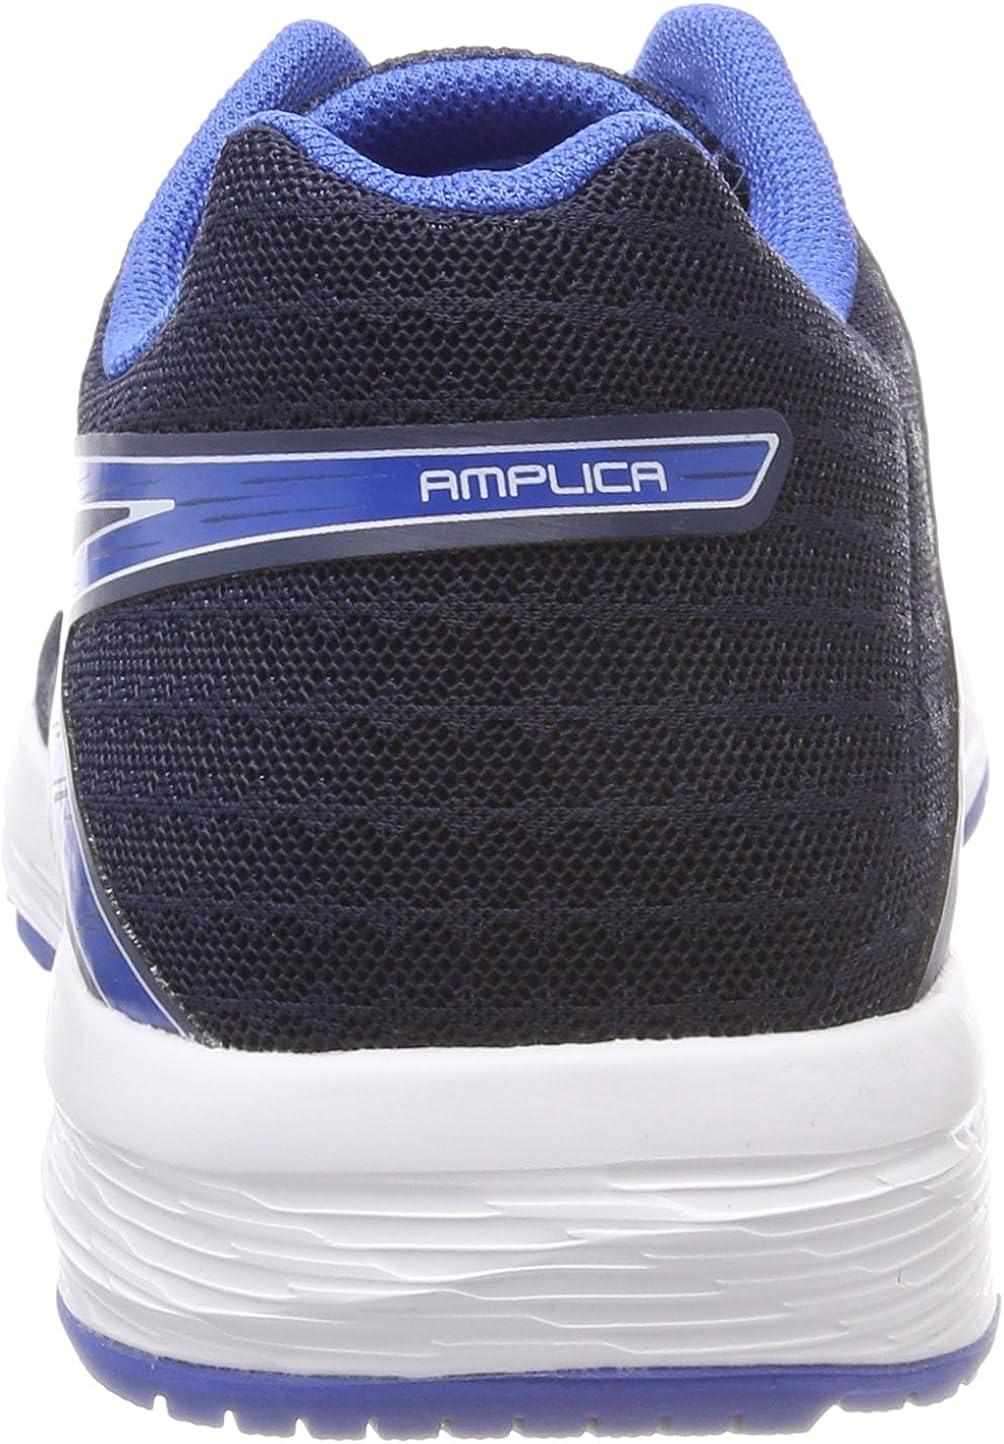 ASICS Amplica, Zapatillas de Running para Hombre: Amazon.es ...